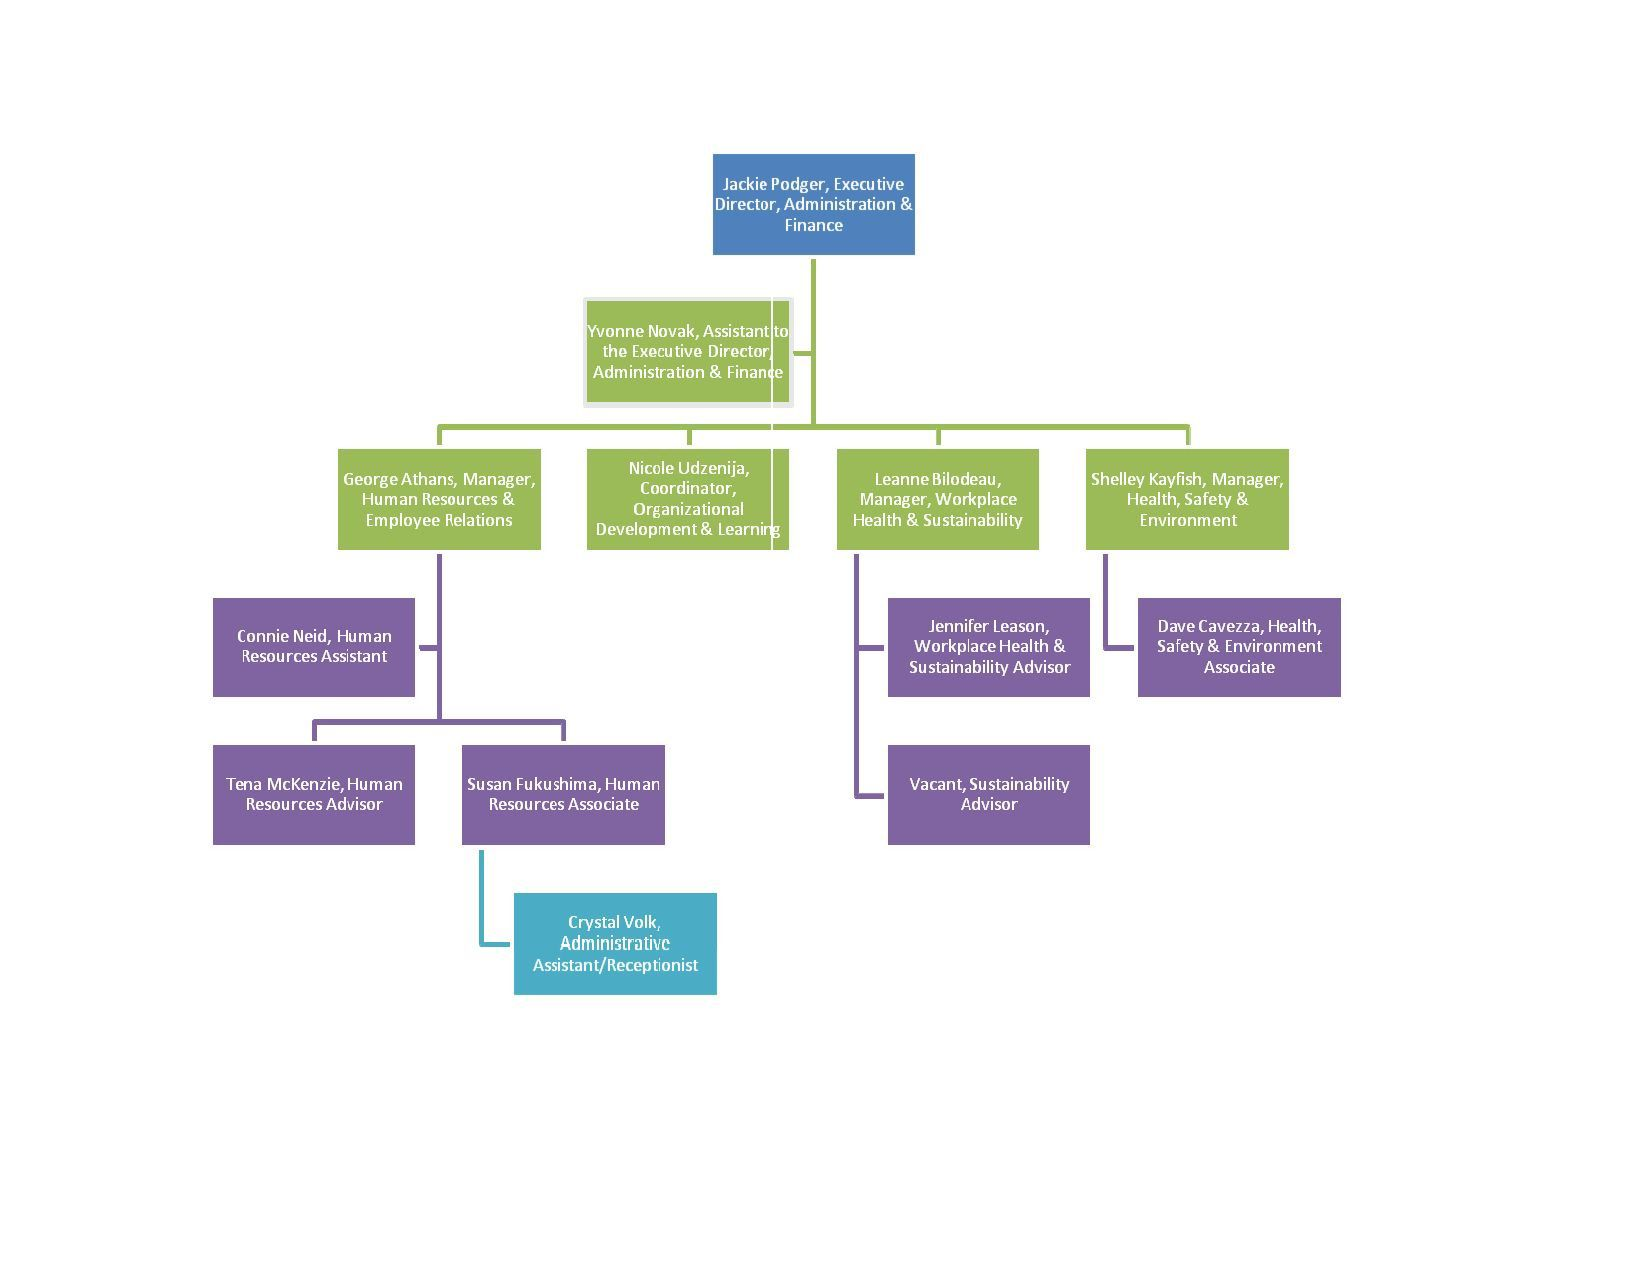 000 Beautiful Organization Chart Template Word 2013 Highest Clarity  Organizational Free MicrosoftFull